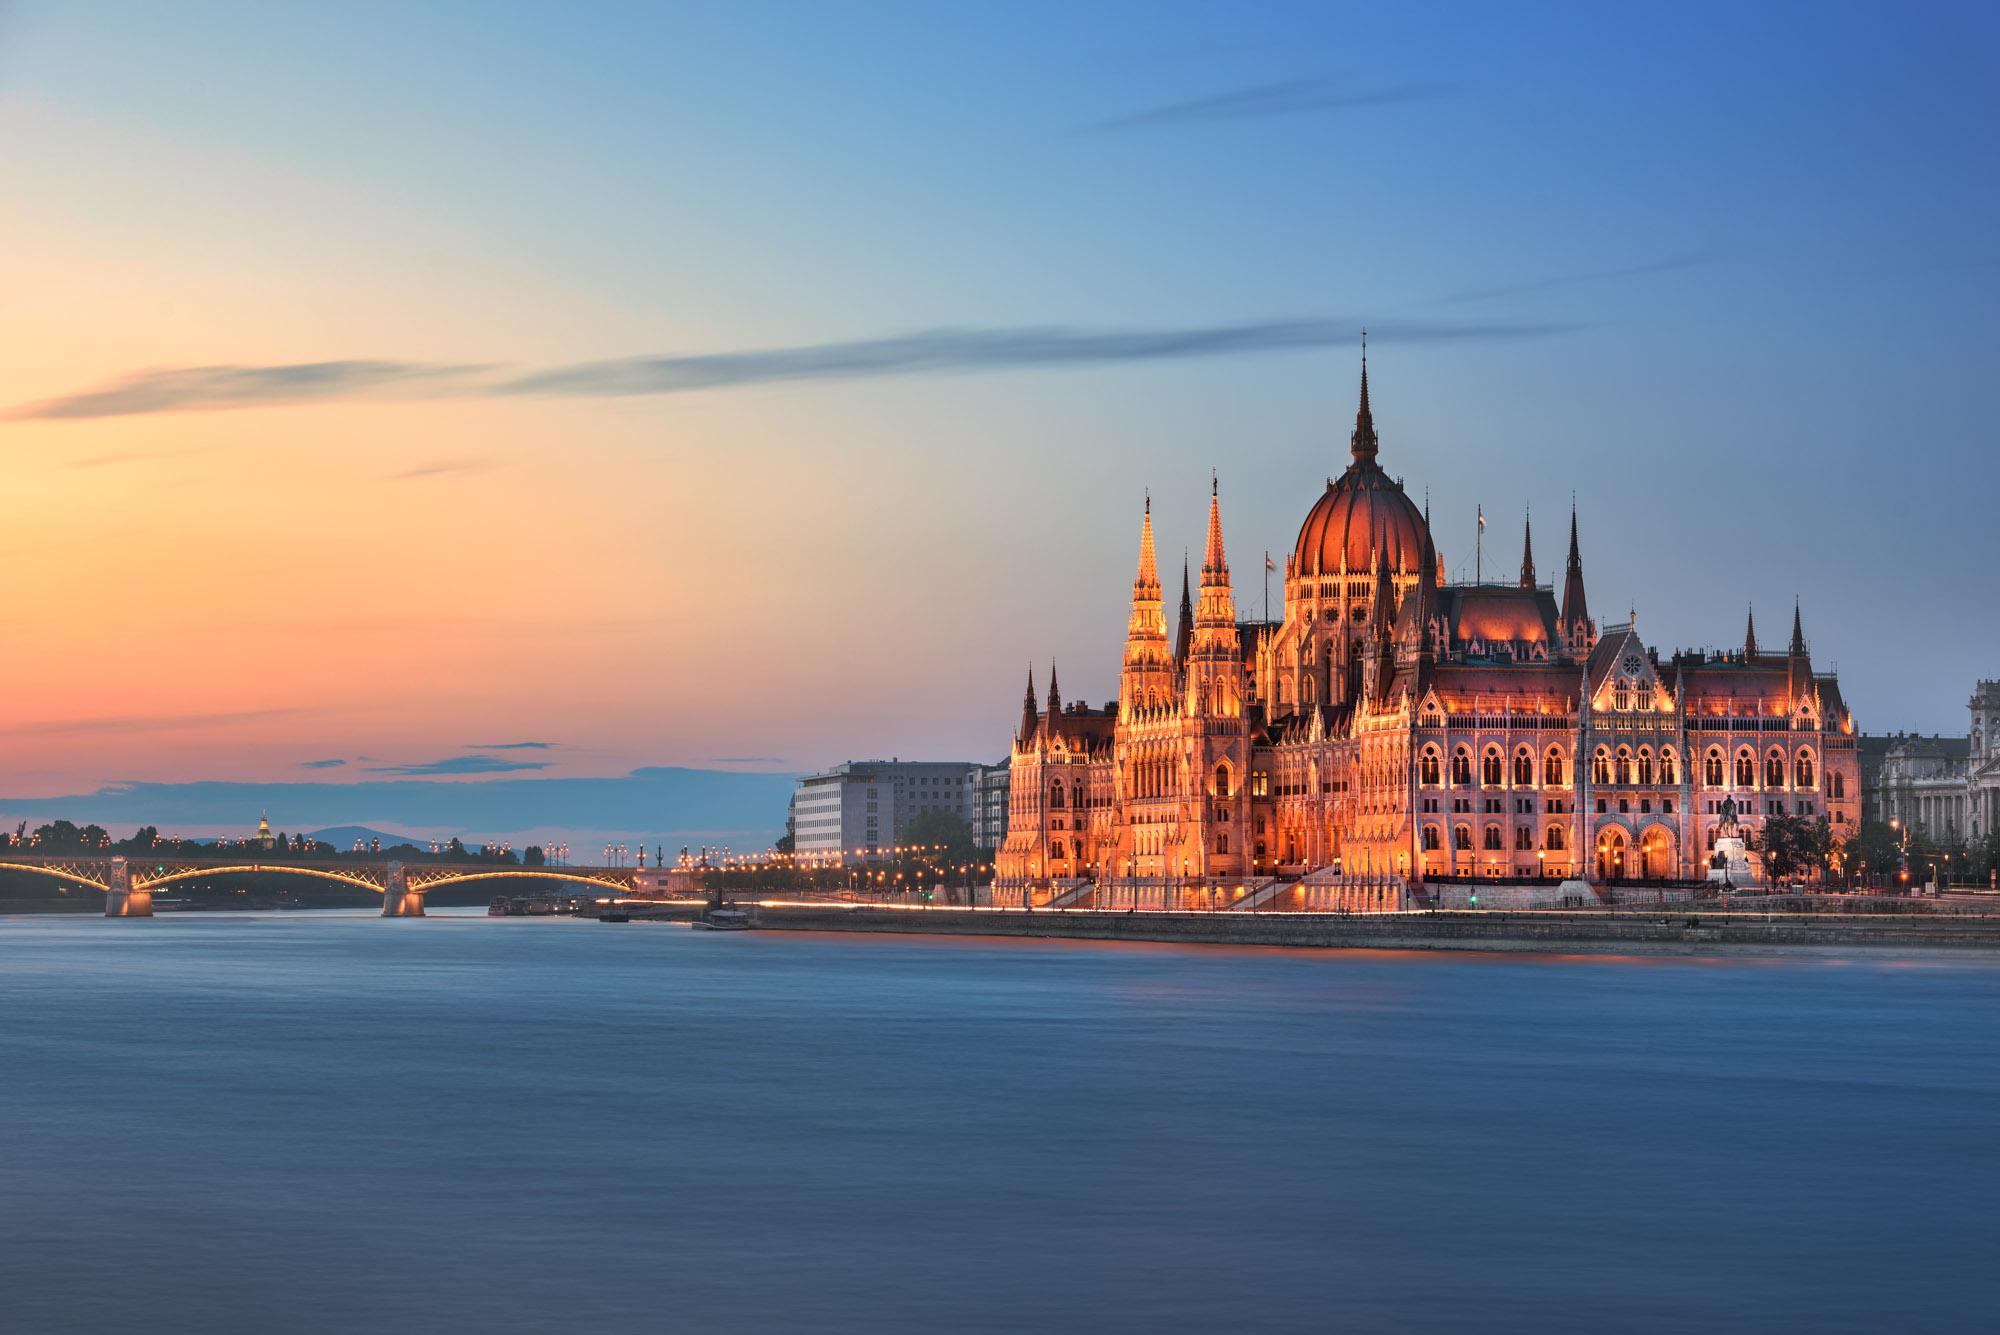 Budapest Parliament, Danube River Embankment, Budapest, Hungary